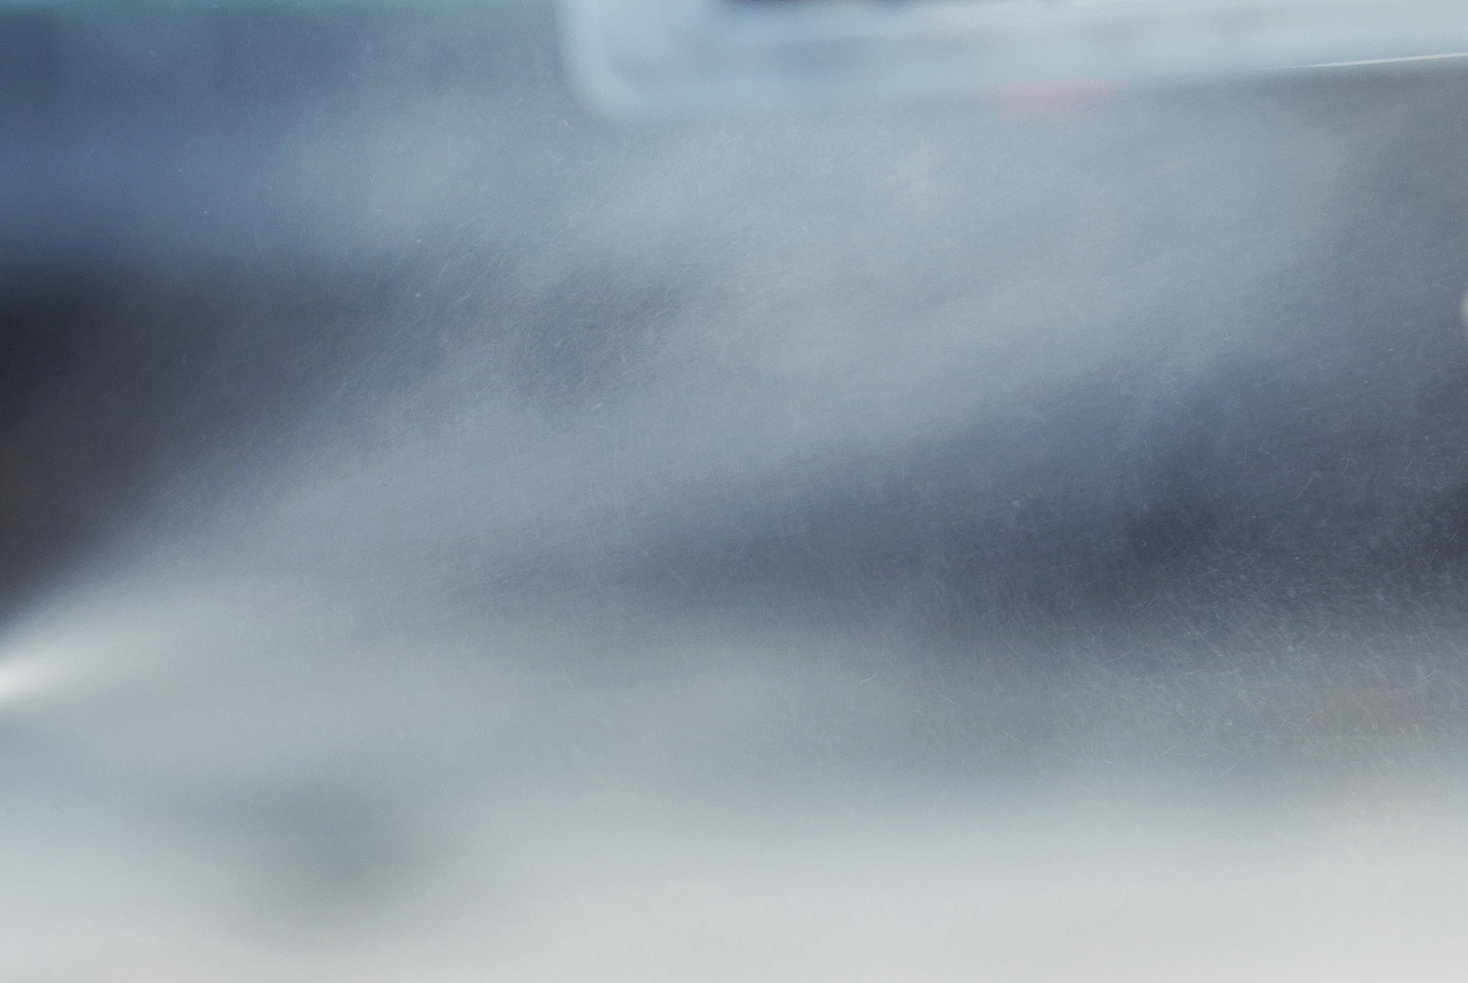 Air Quality Purification